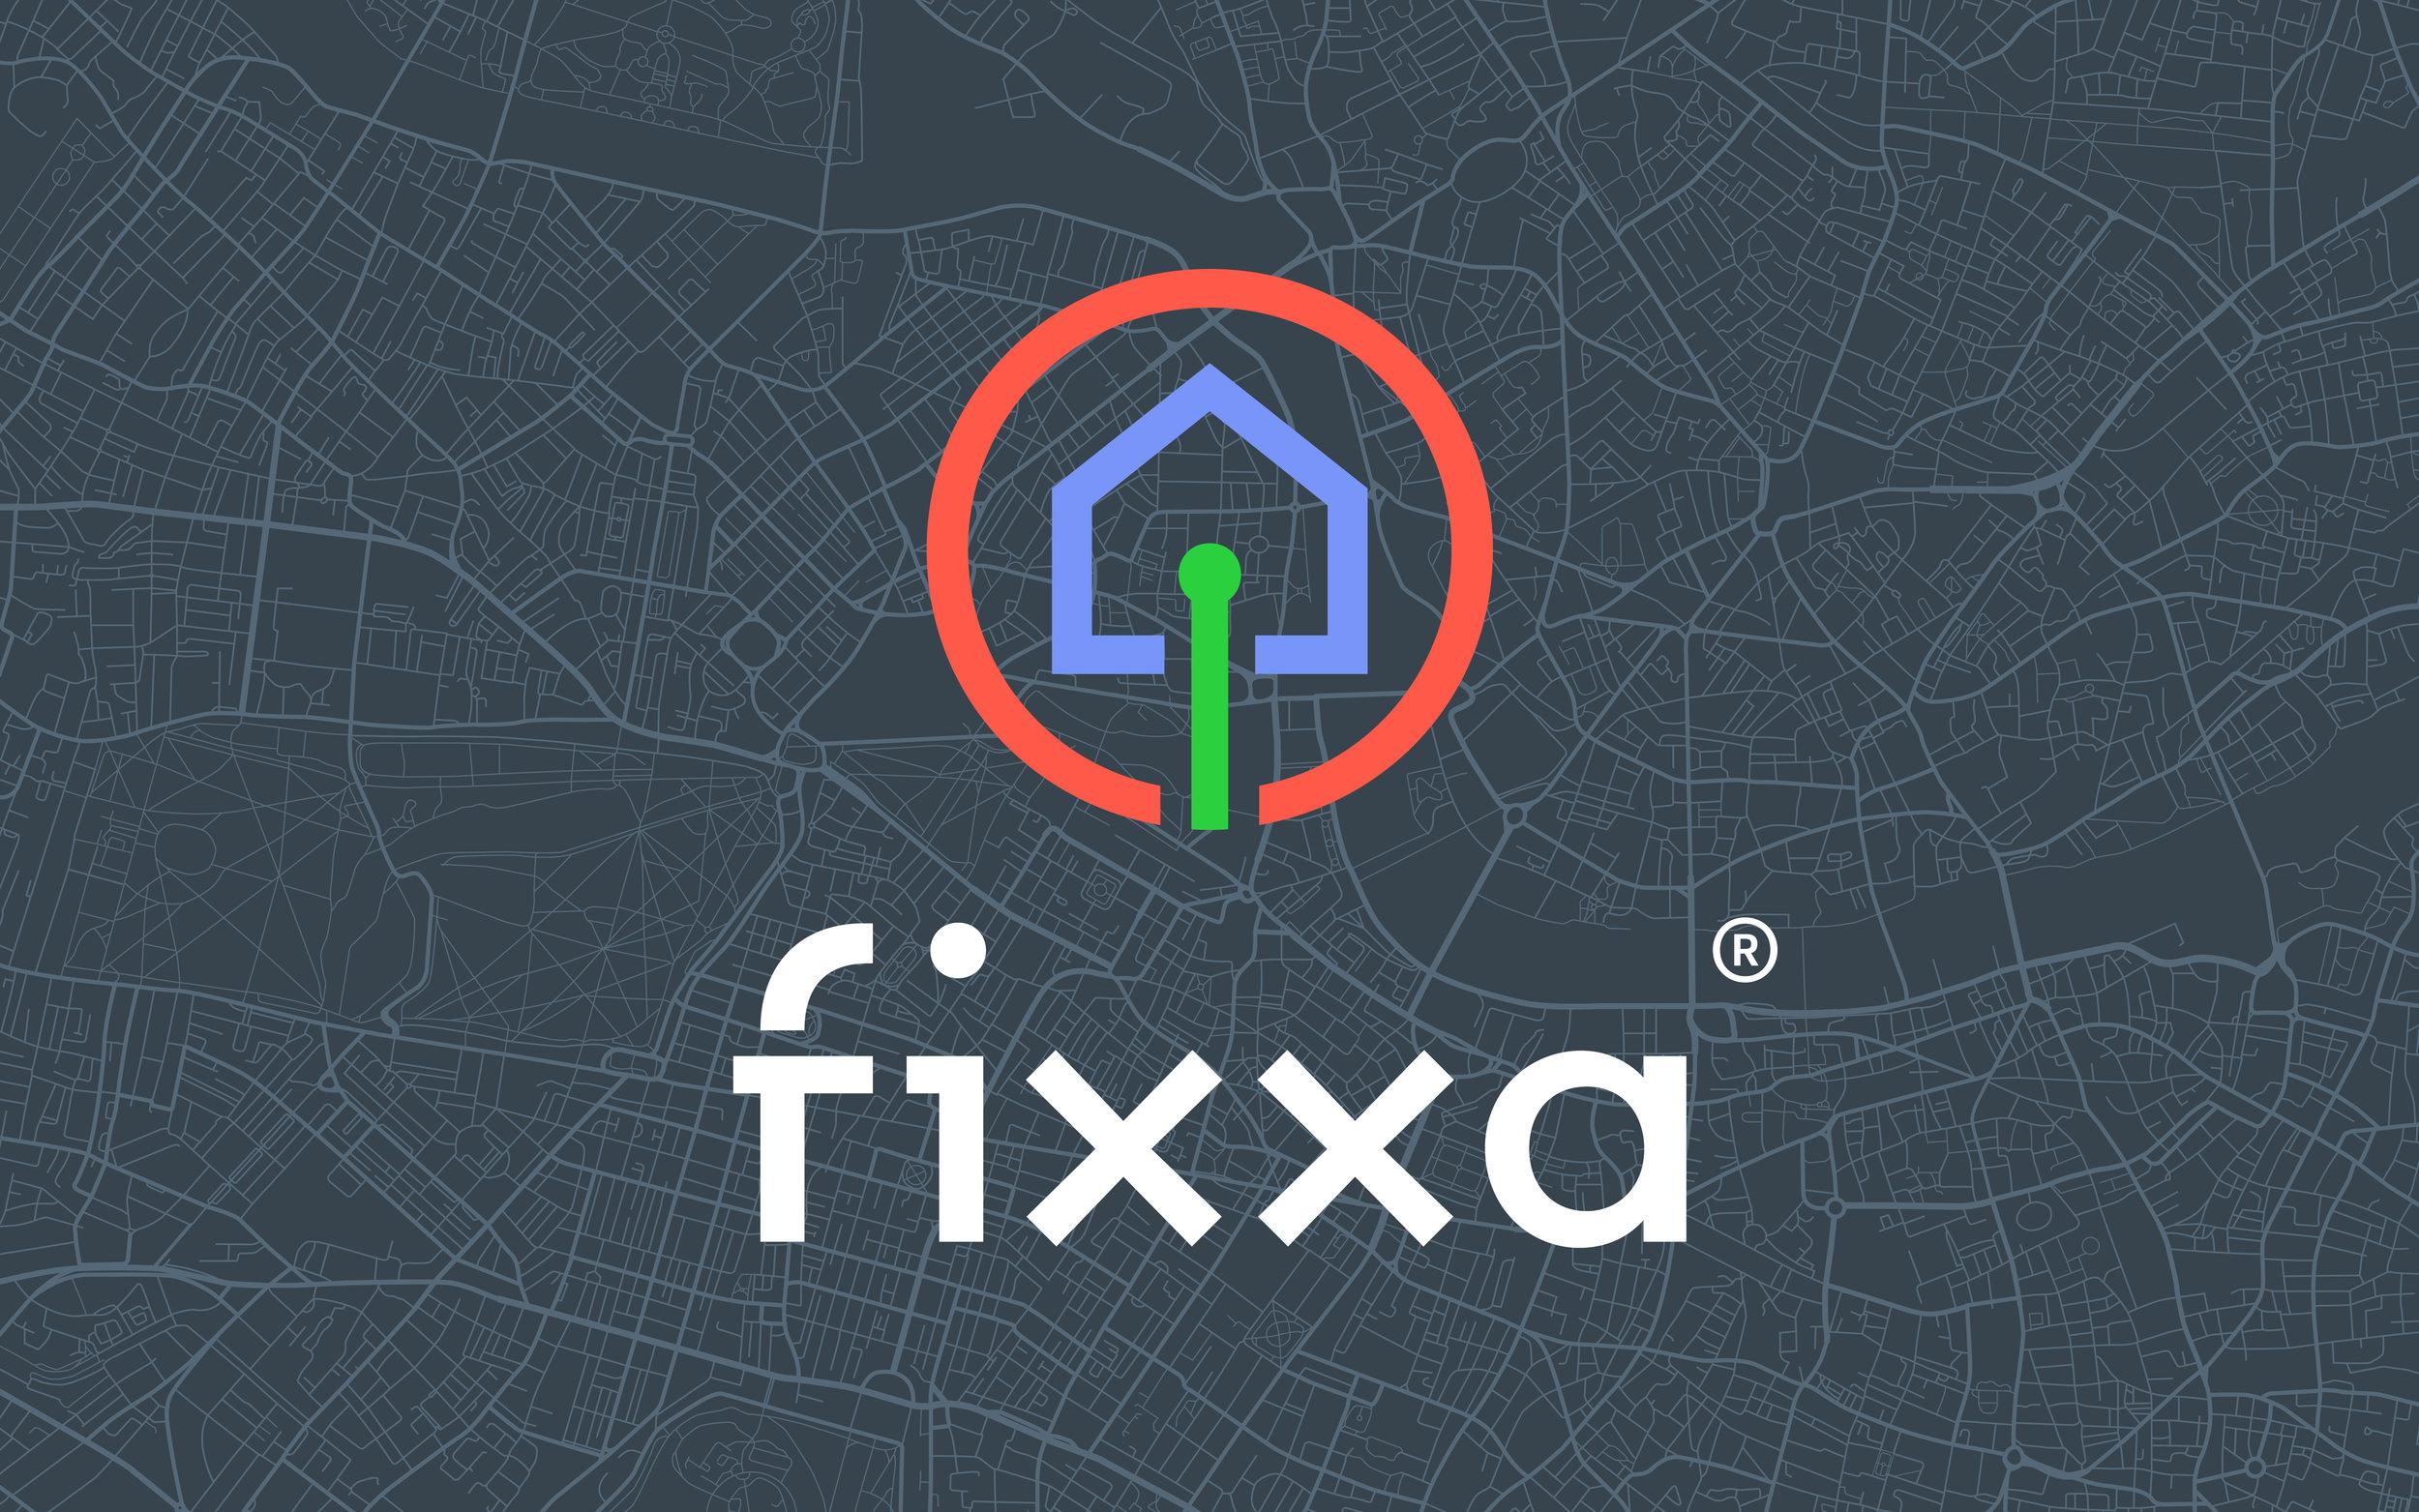 Fixxa_Case_Study6.jpg